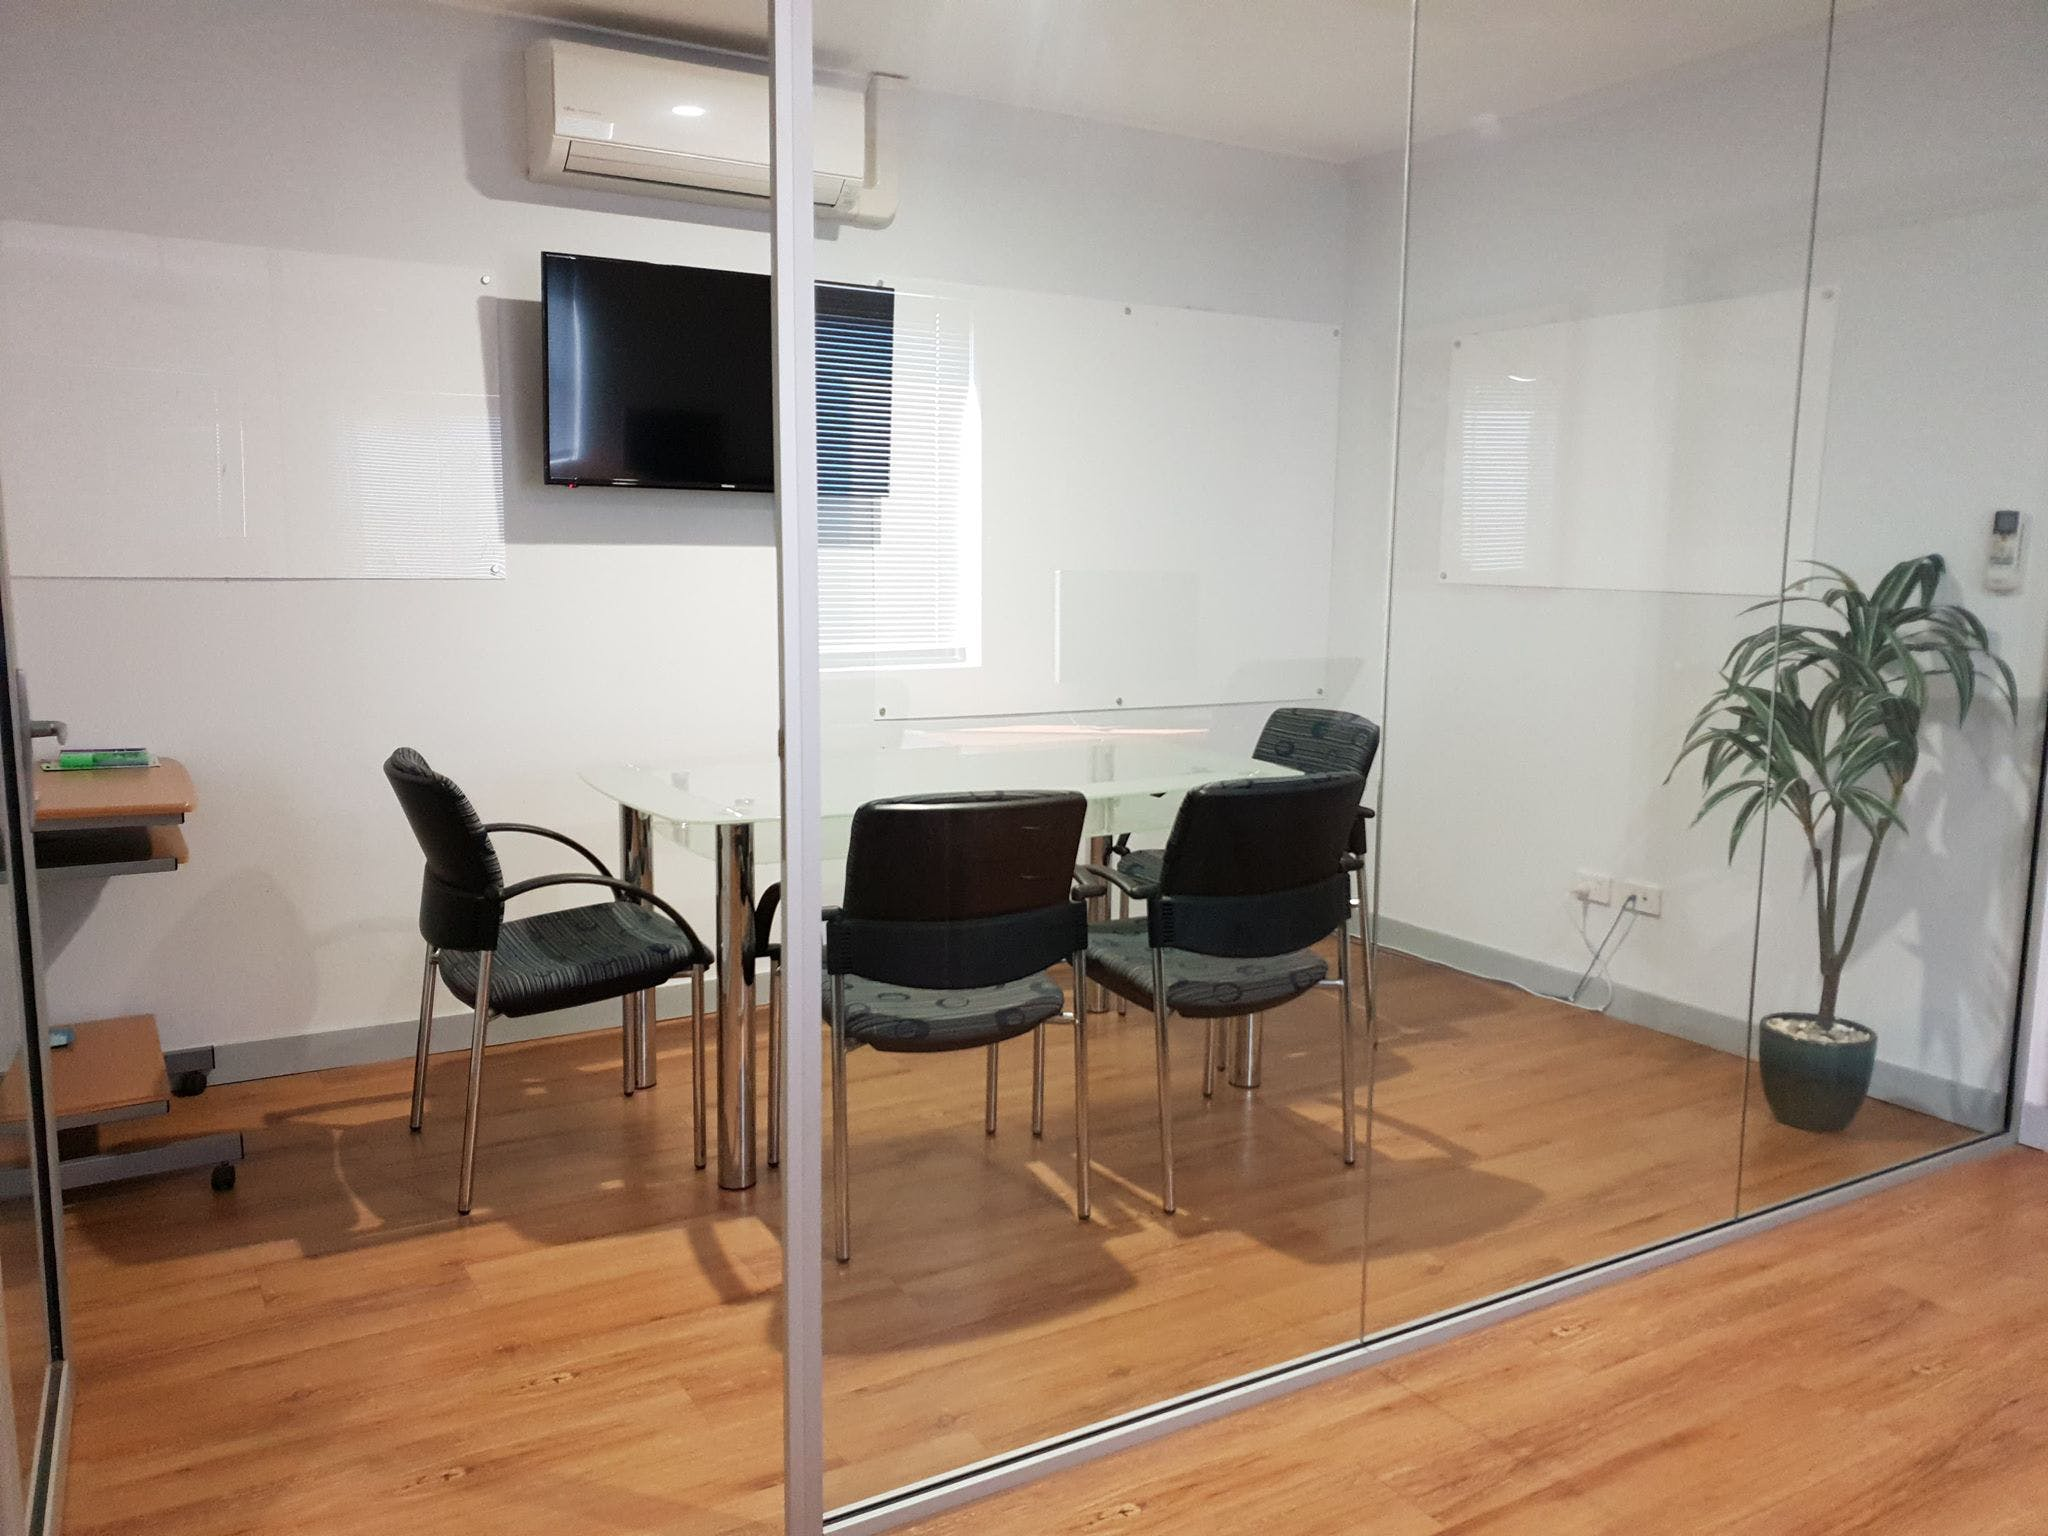 Meeting room at Buderim Hot Desks, image 1